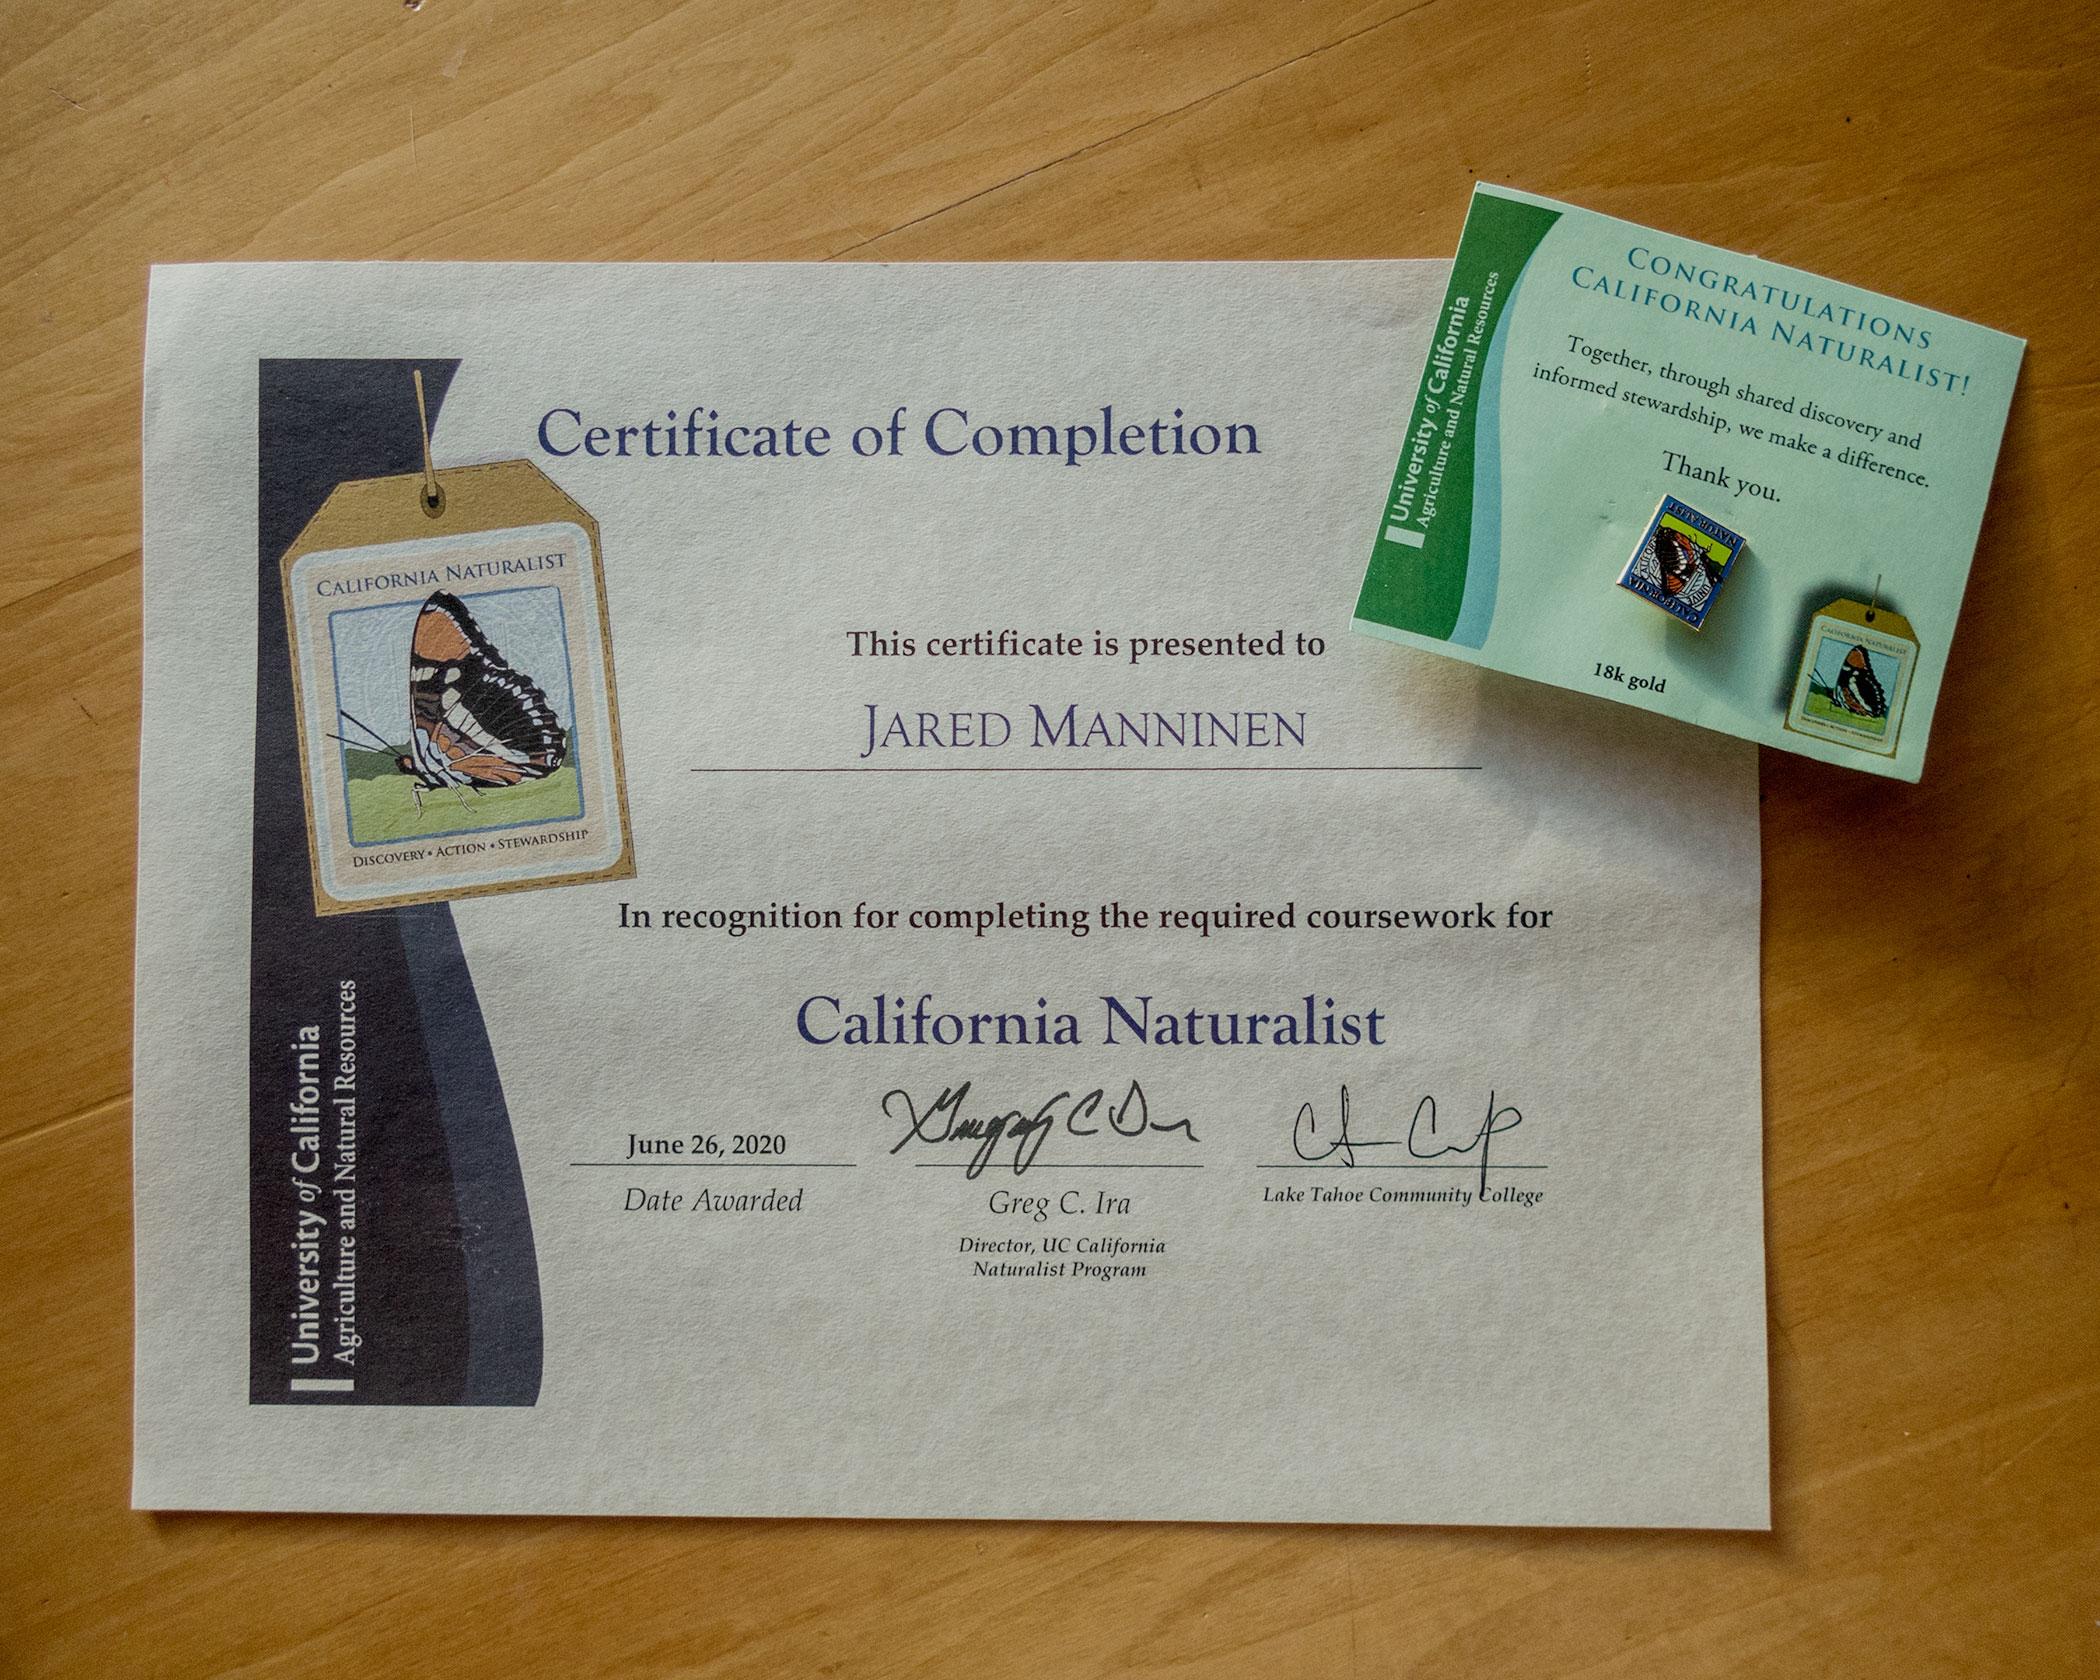 California Naturalist Certificate and Pin